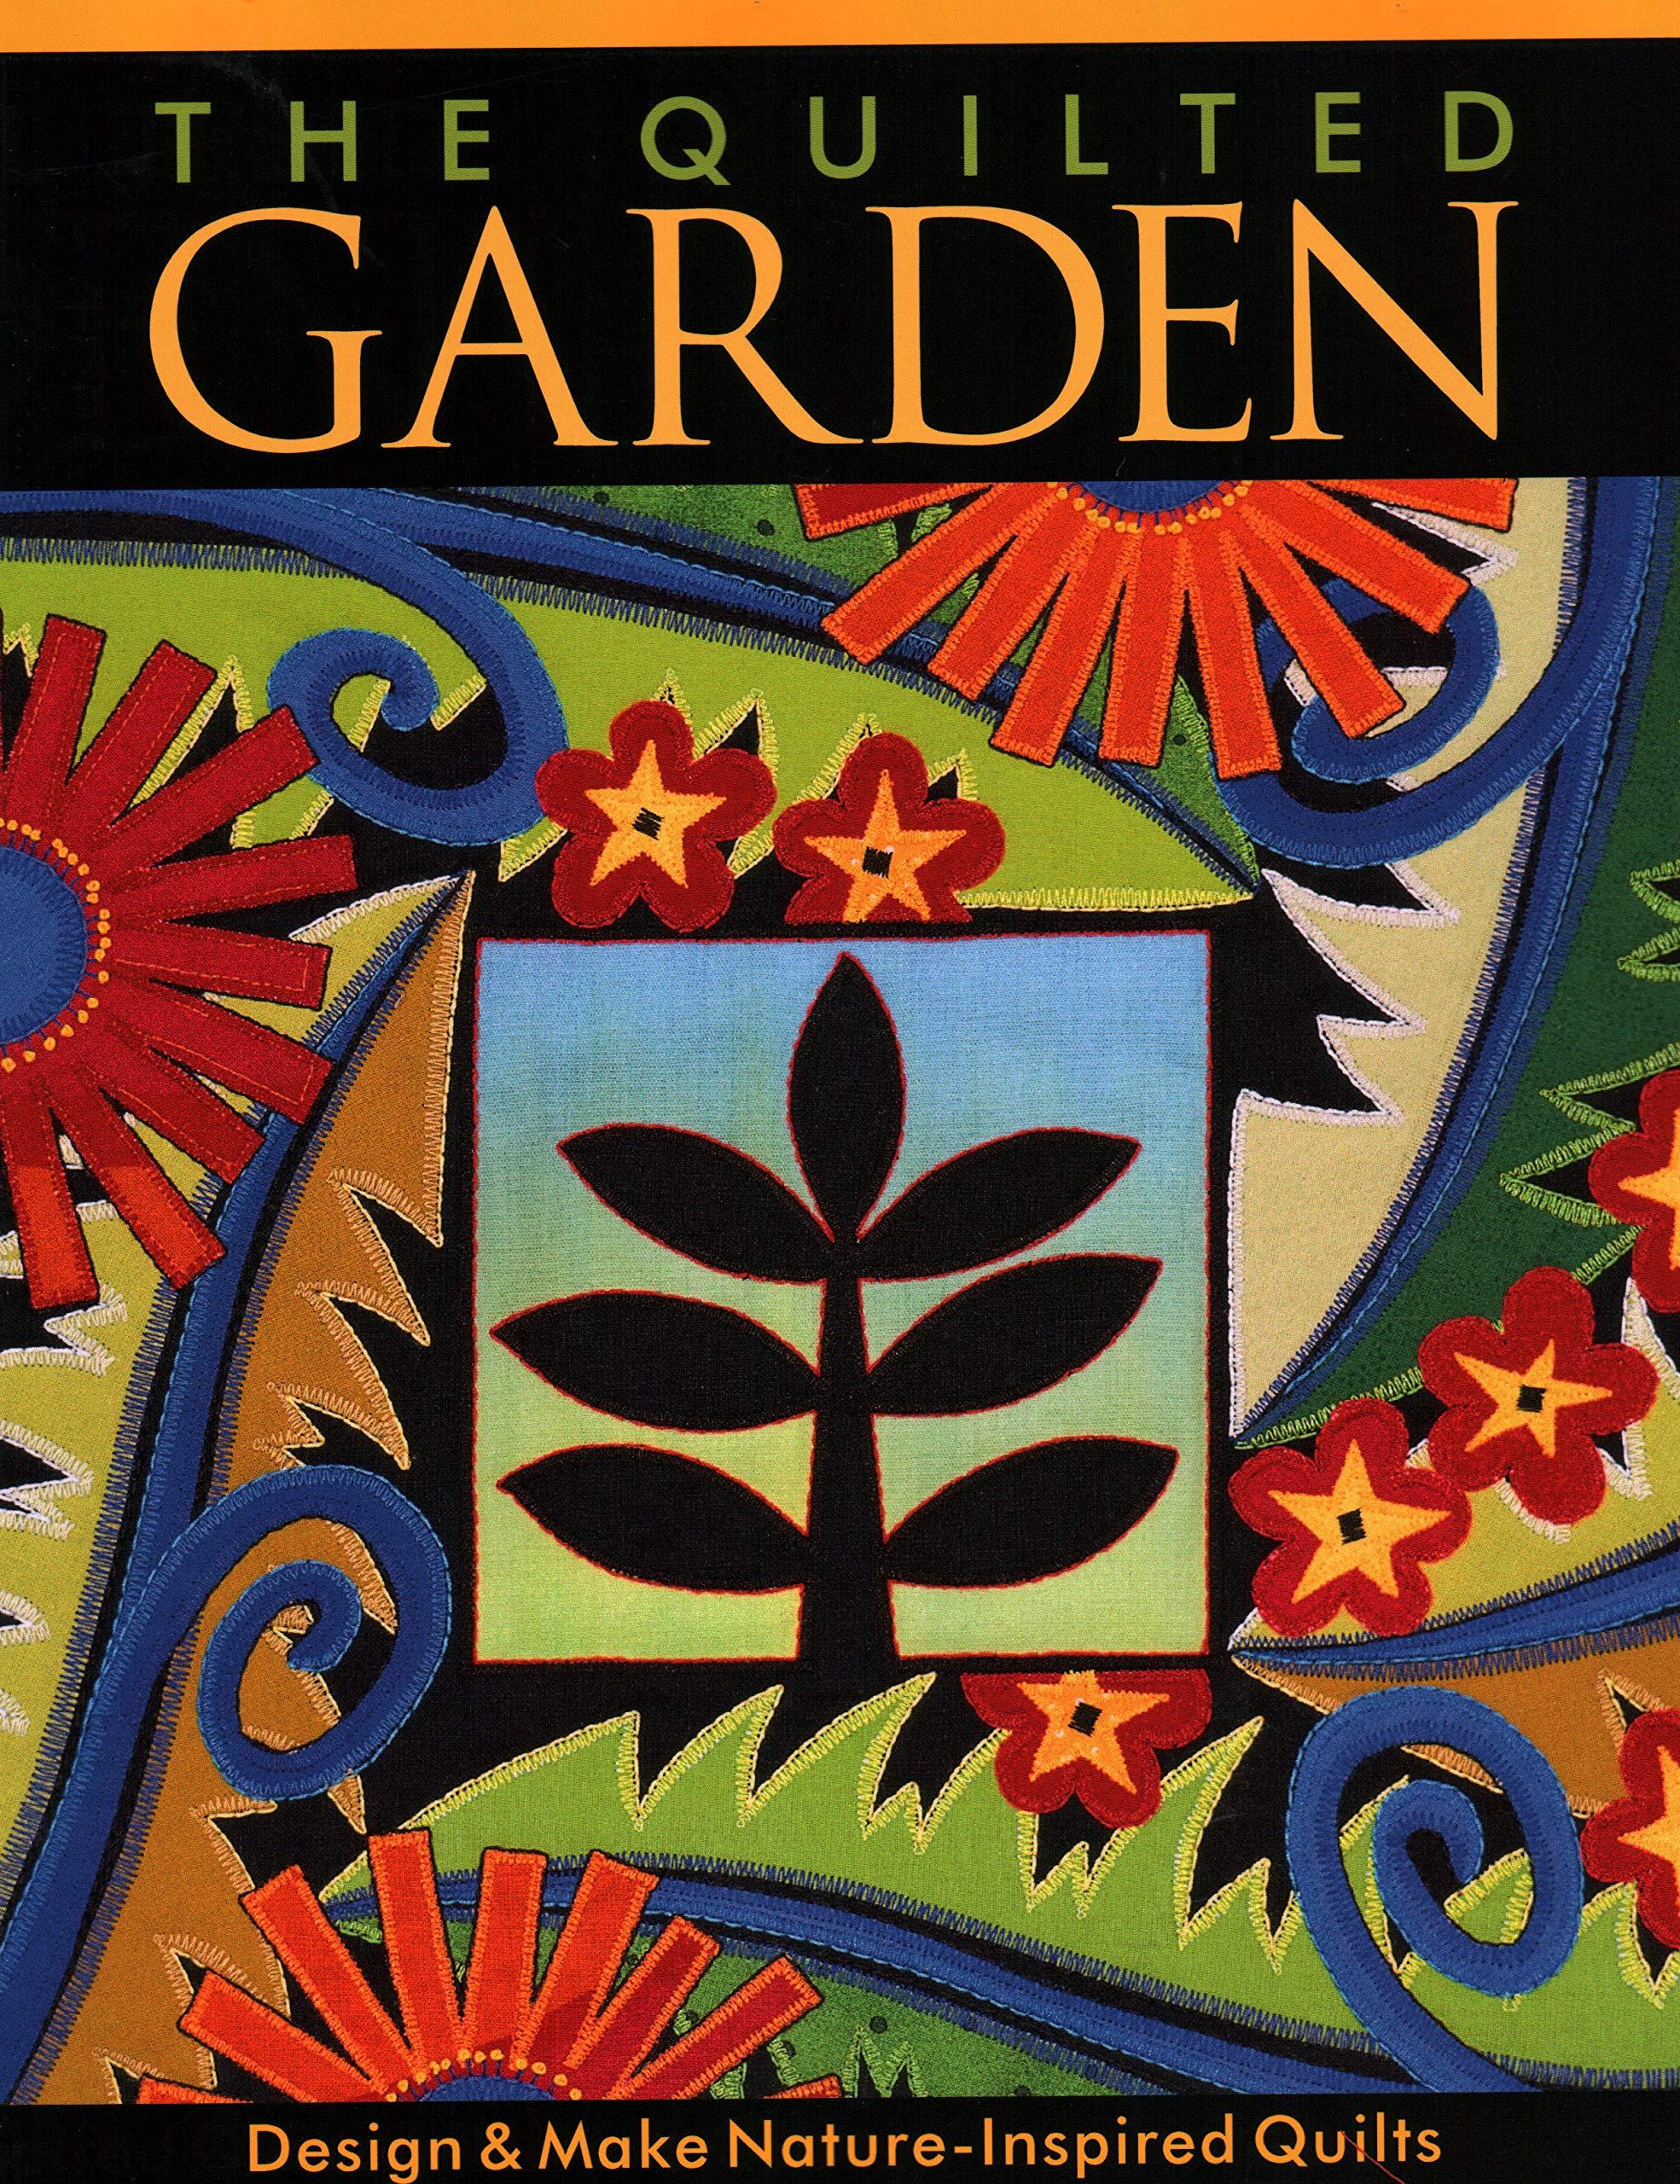 The Quilted Garden Jane A Sassaman 0734817102182 Amazon Com Books